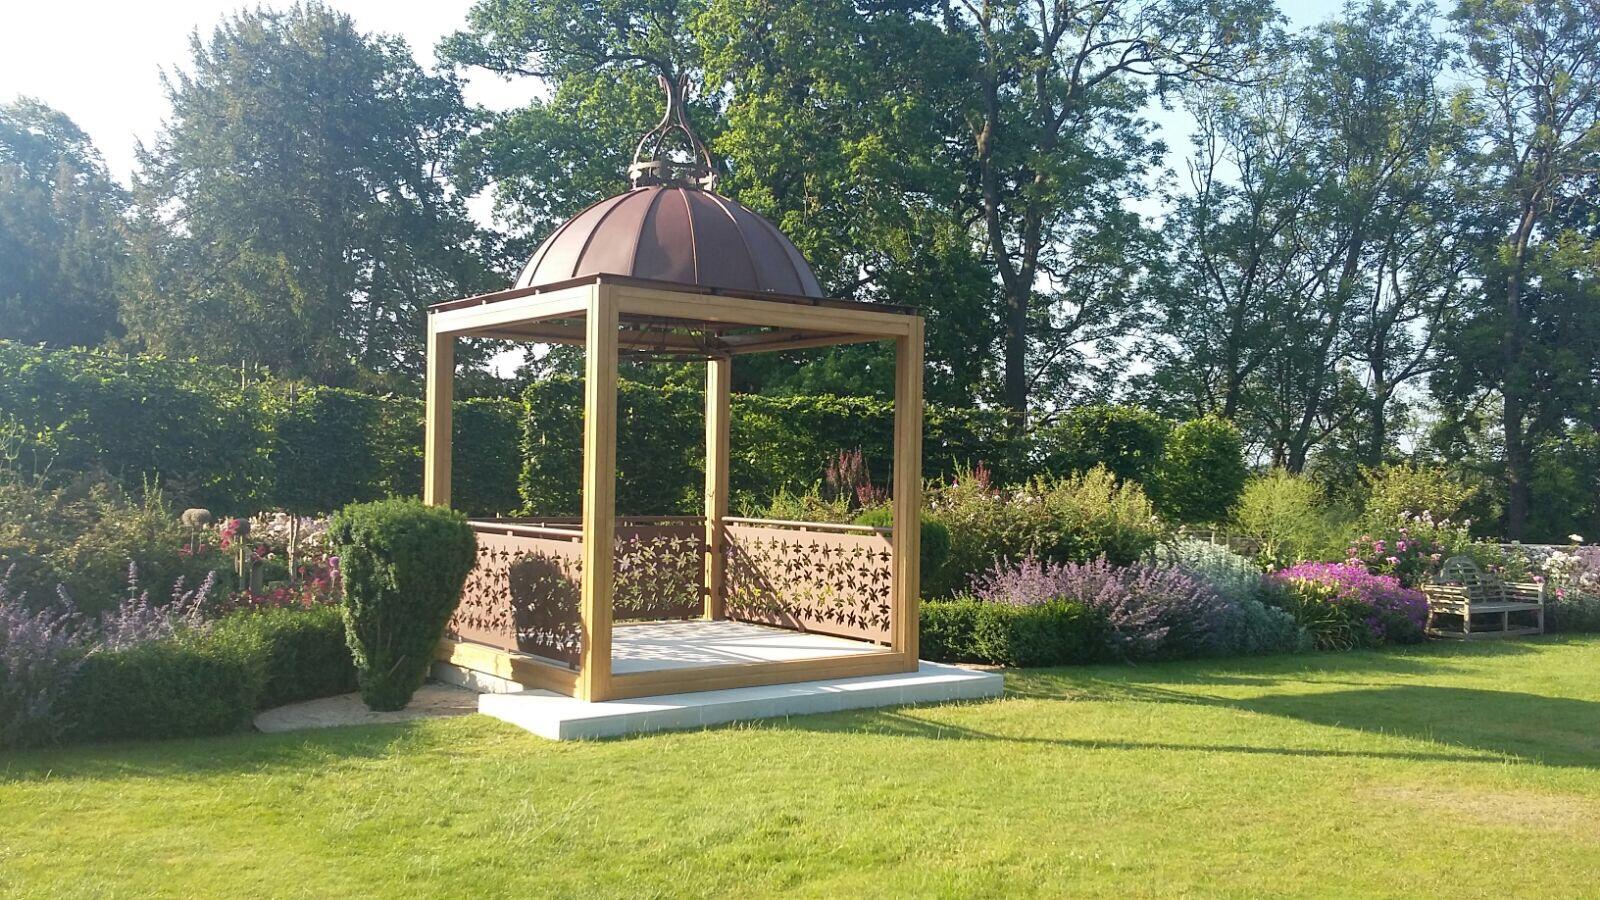 The Wood Norton's New Outdoor Wedding Pavilion